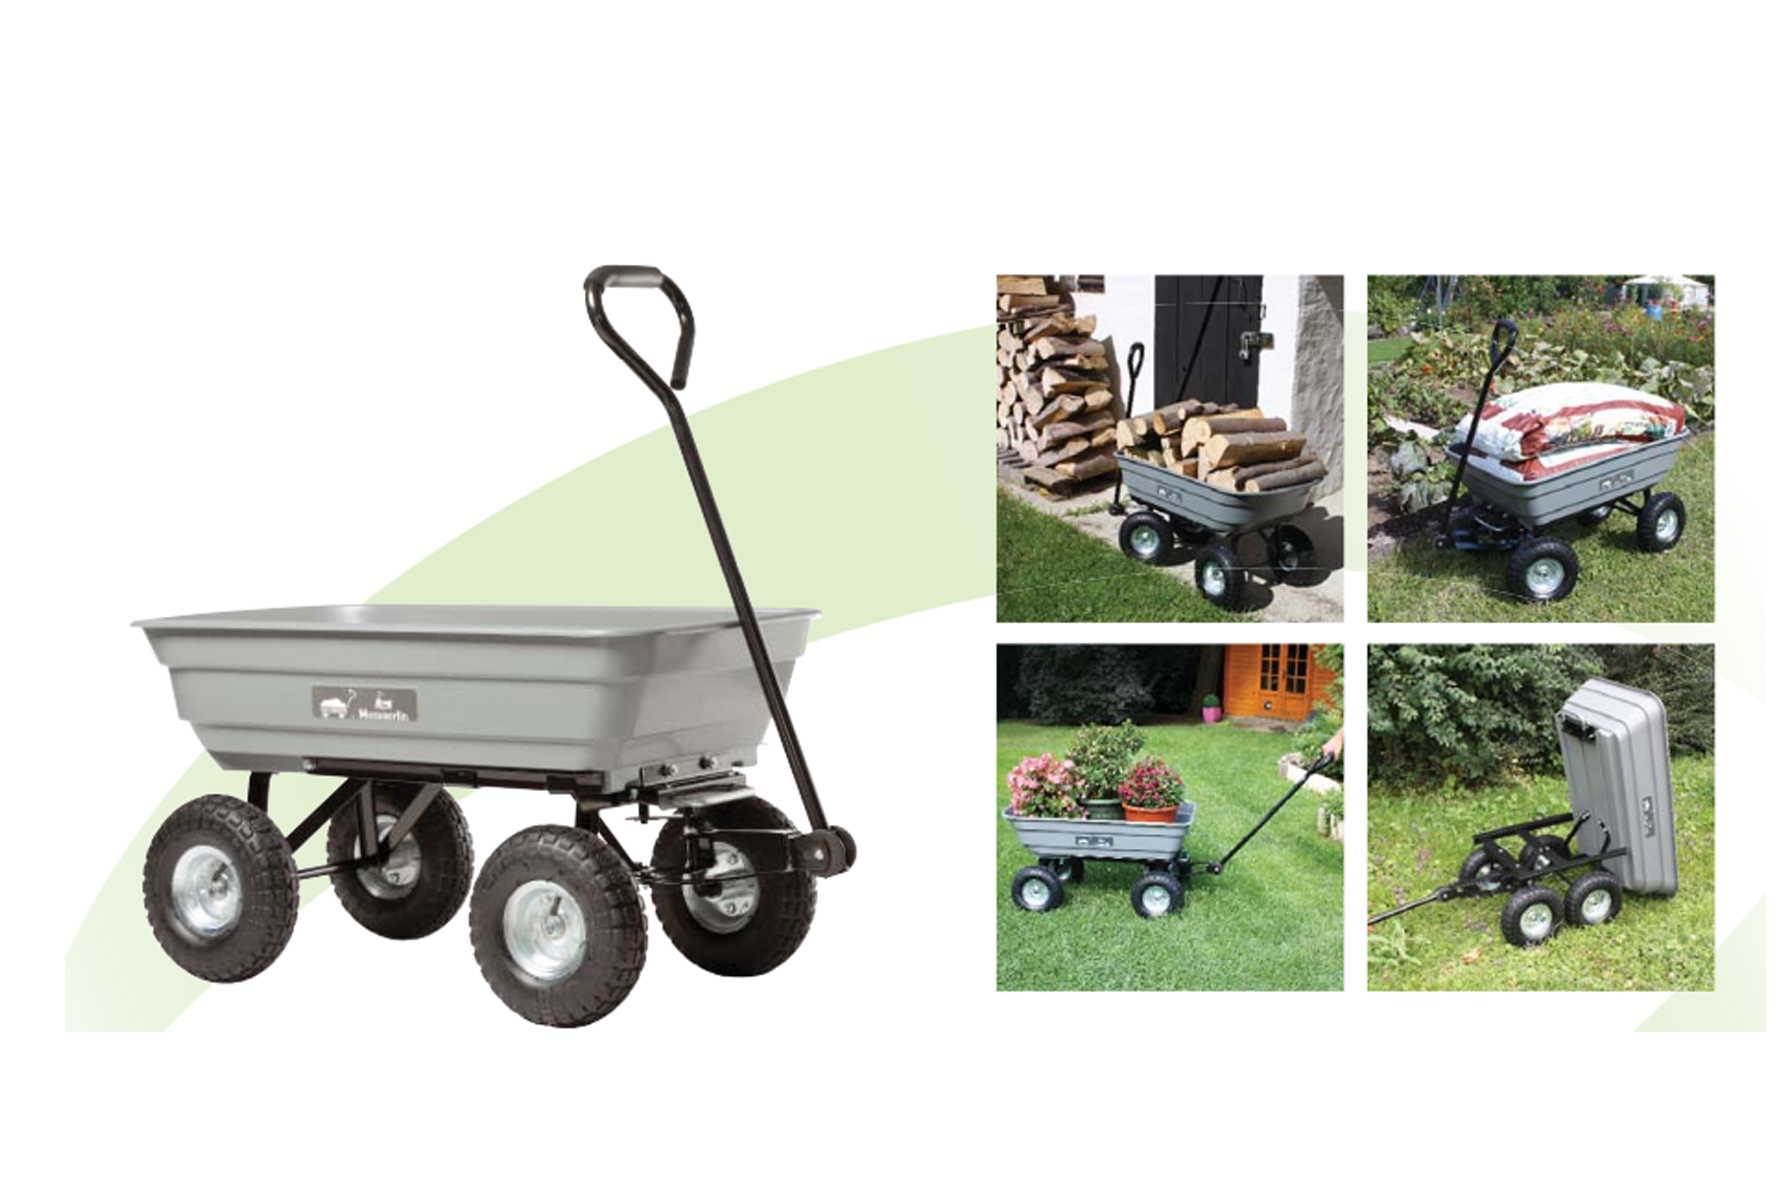 chariot de jardin haemmerlin achat en ligne ou dans notre. Black Bedroom Furniture Sets. Home Design Ideas